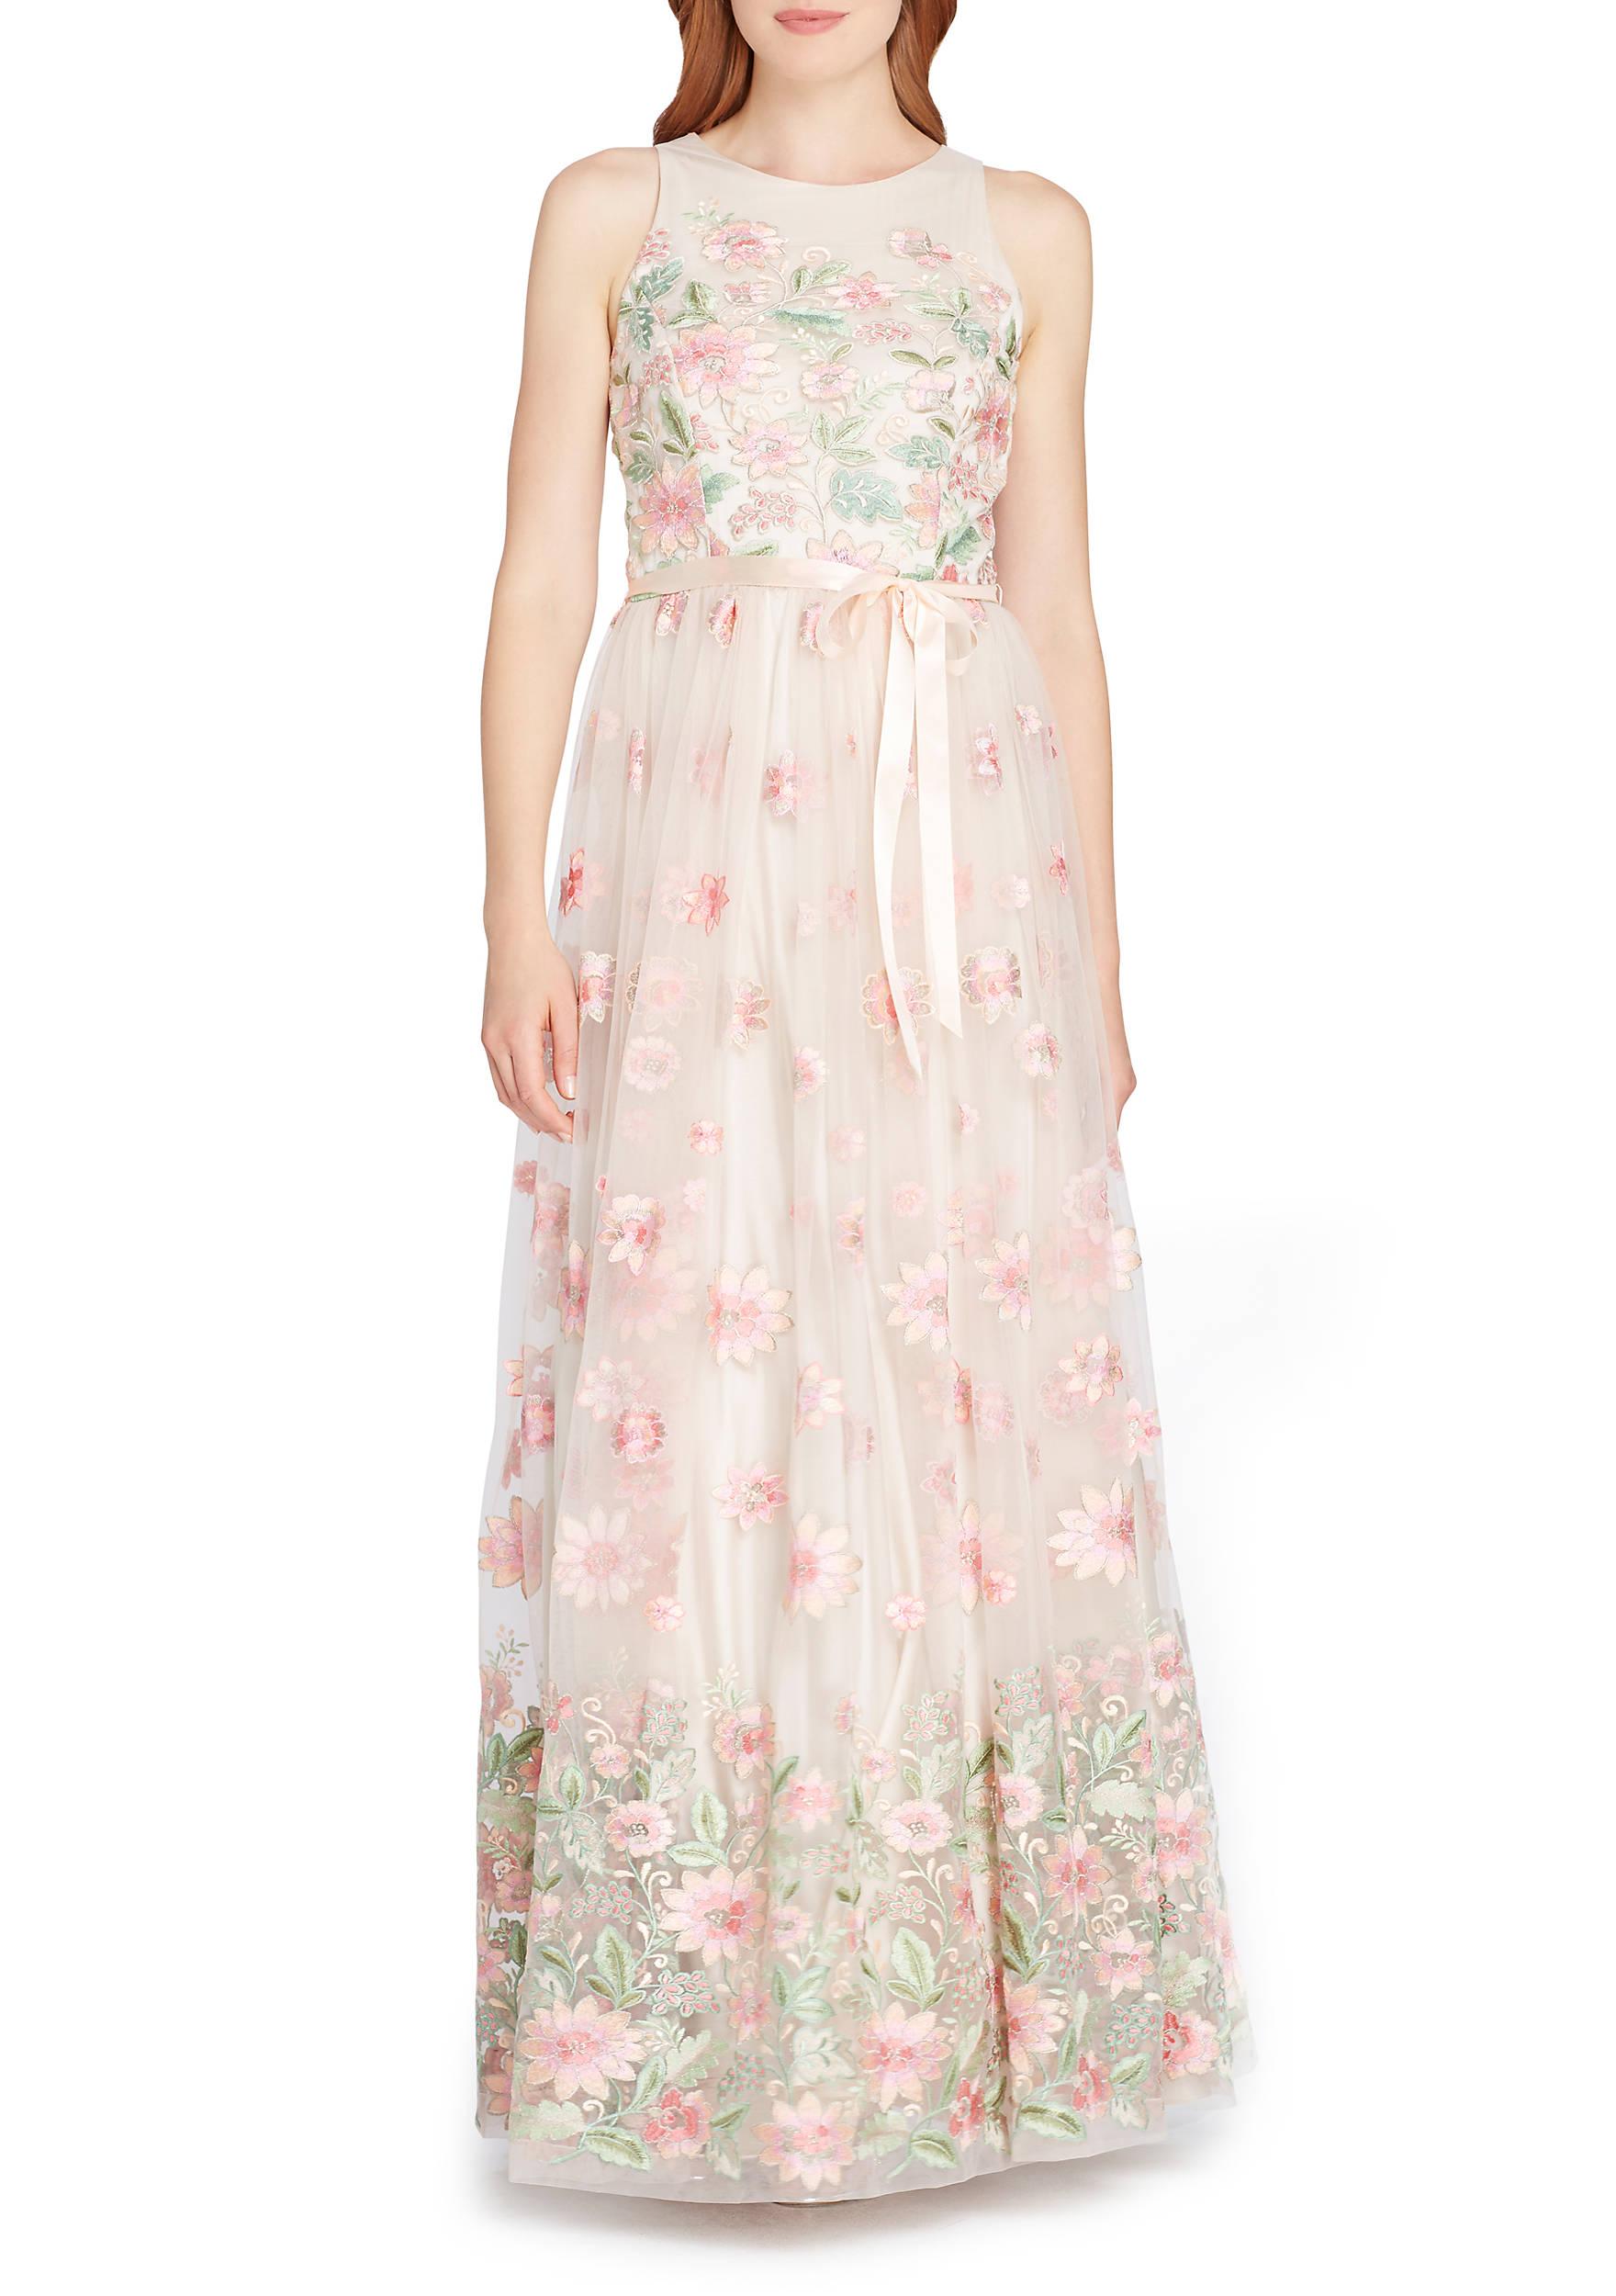 Fancy Belk Gowns Illustration - Images for wedding gown ideas - cedim.us